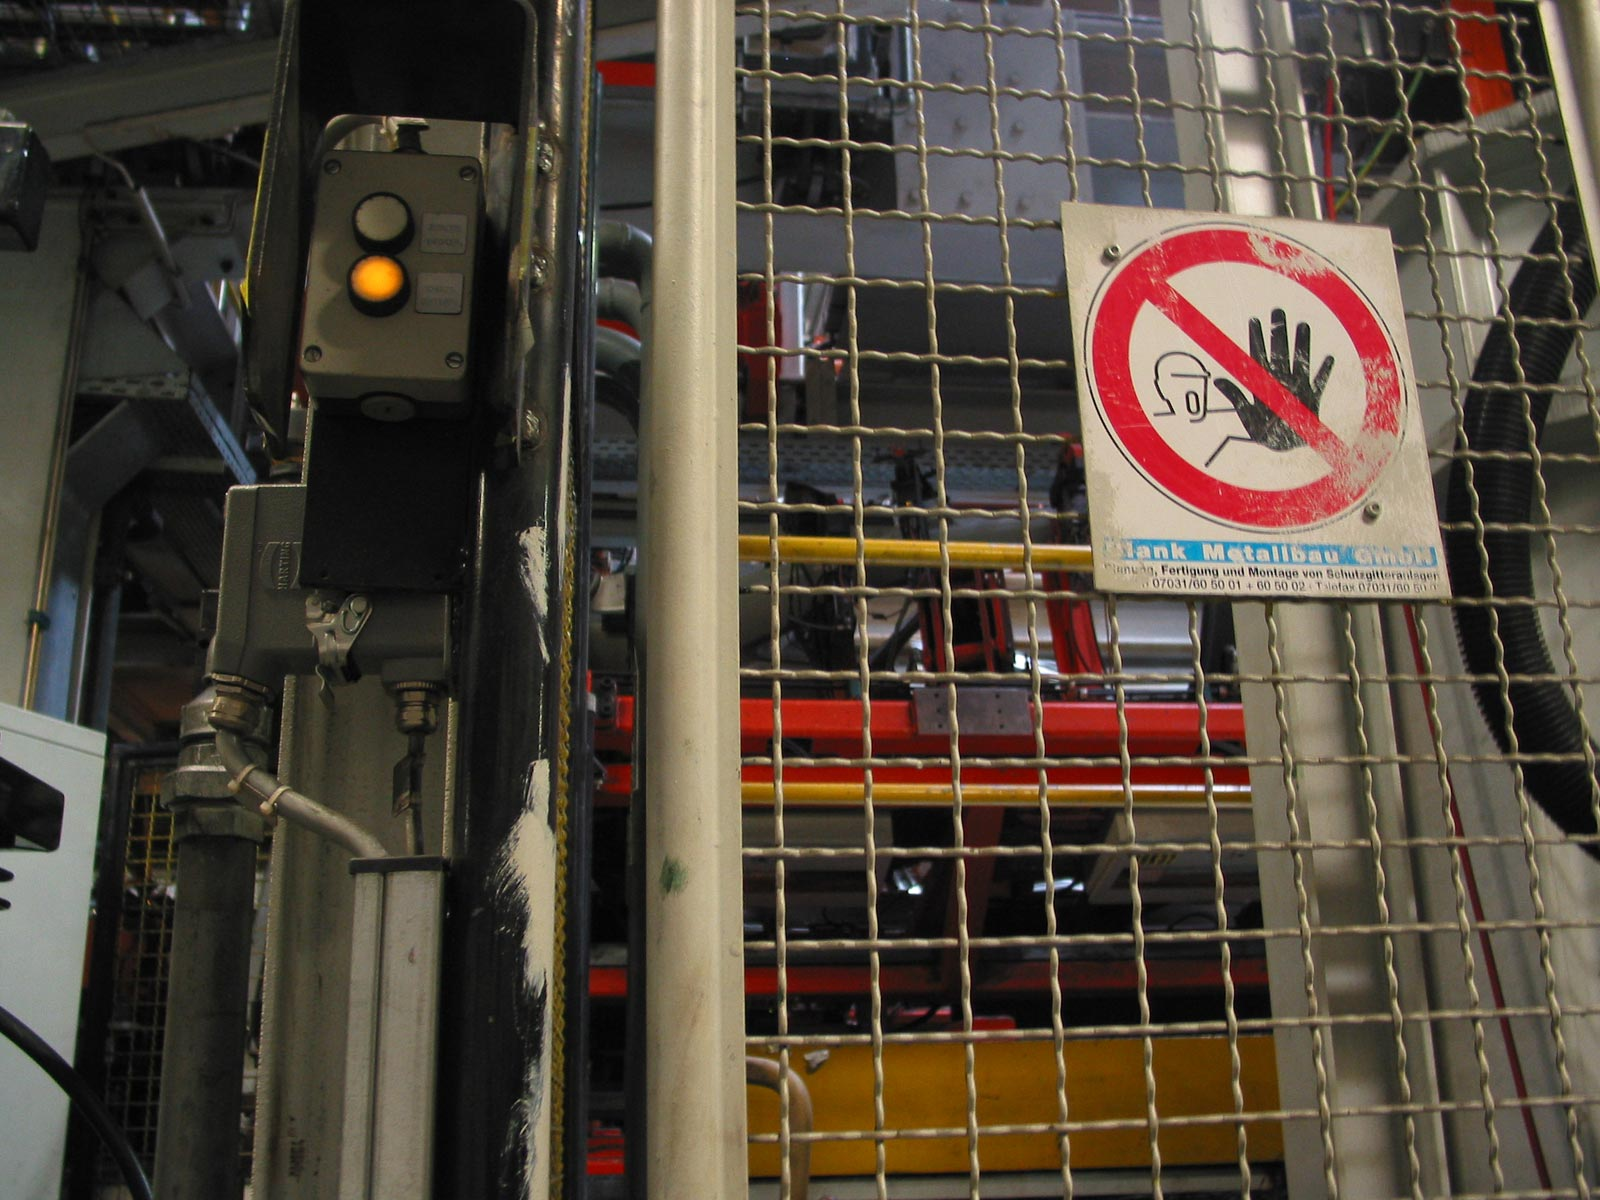 Alldata Bmw Euro Motor Group Llc Bmw Repair Pasadena Ca